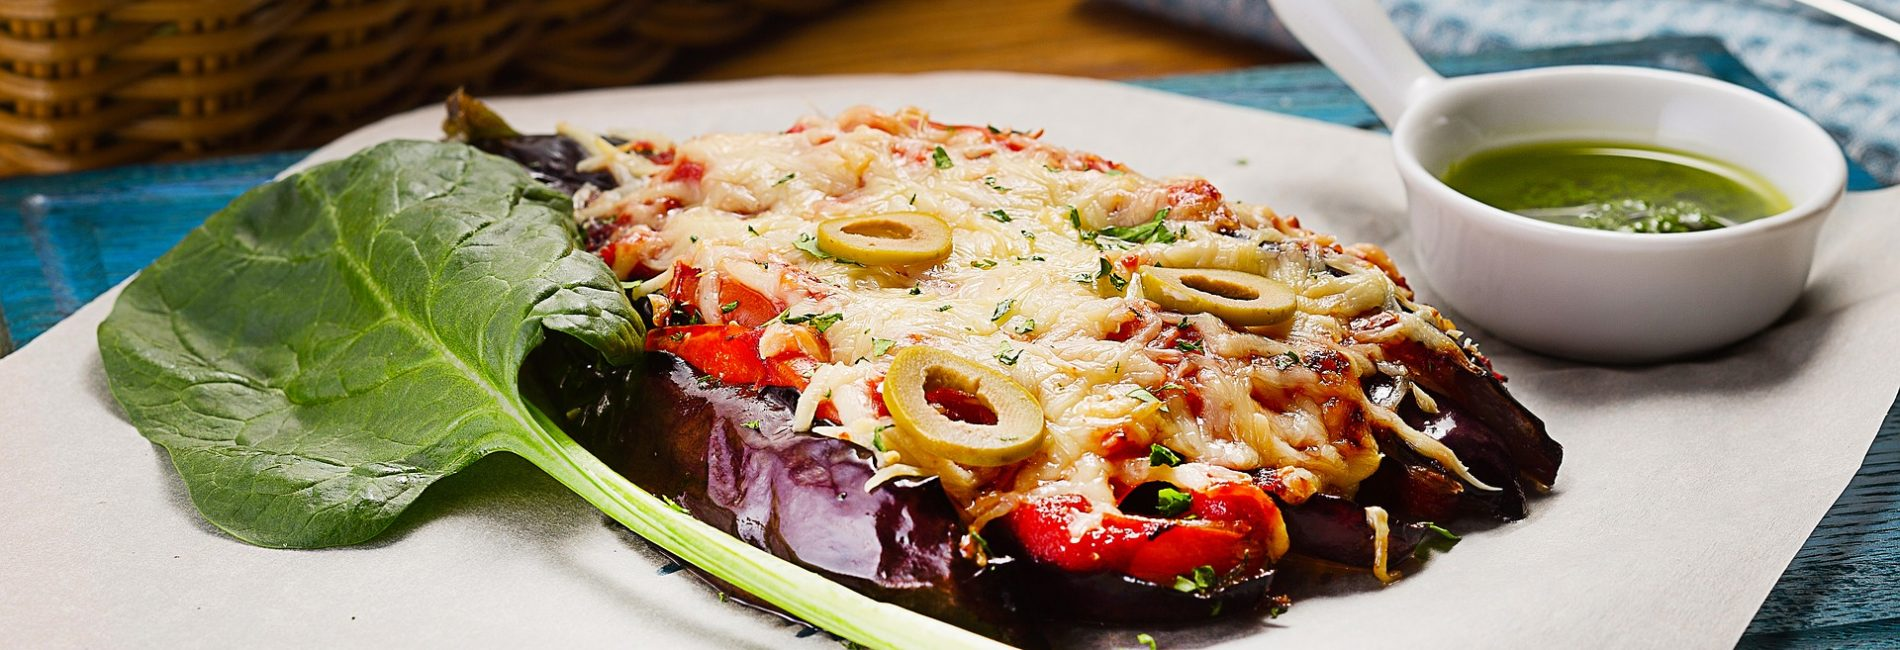 Aubergine pizza : pizza sans gluten !